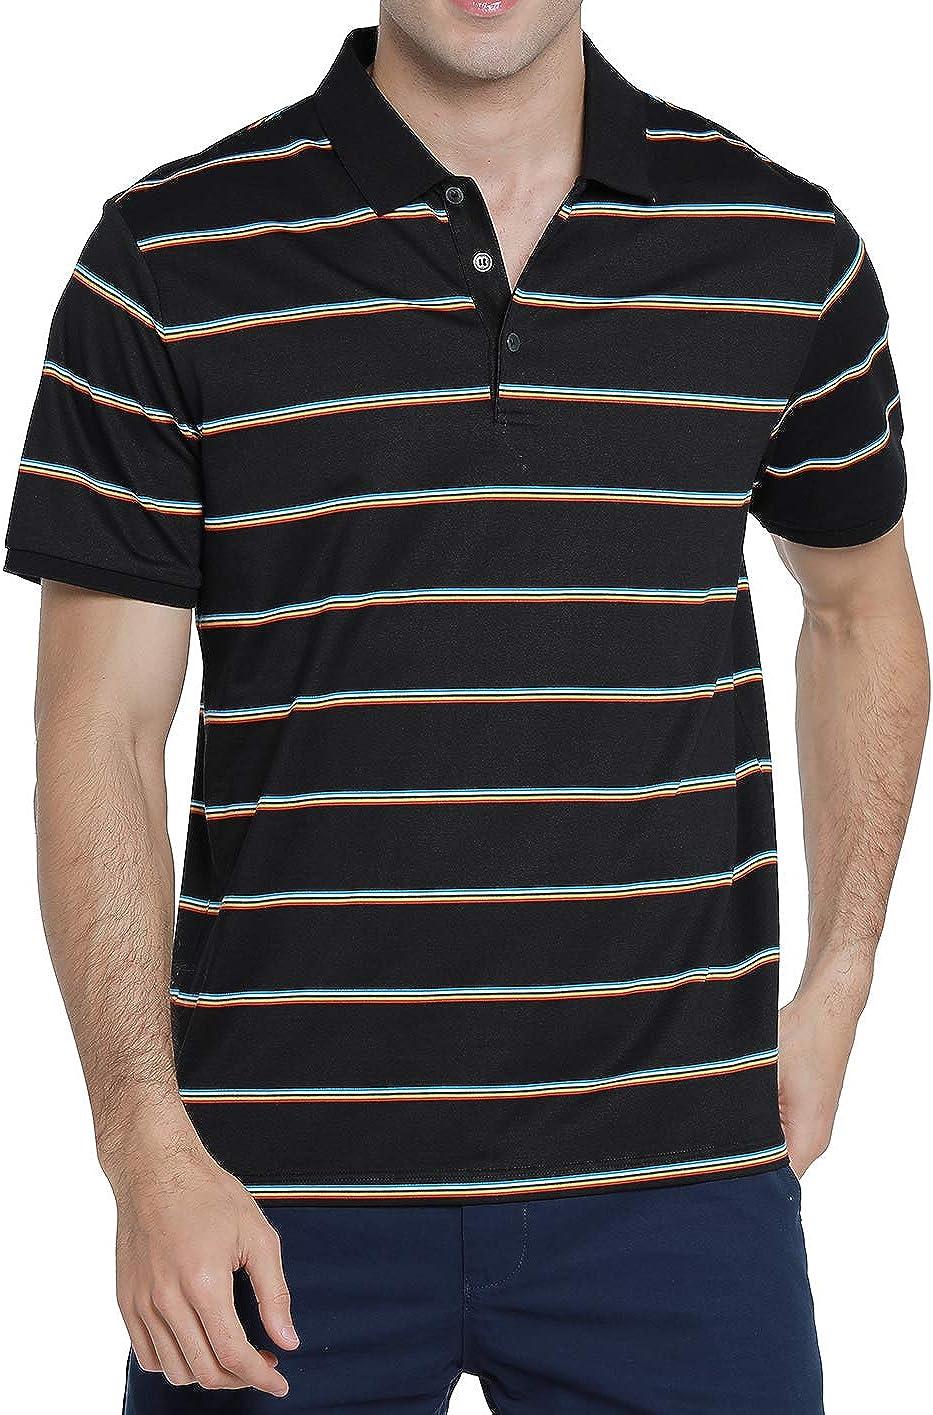 Dronkon Men's Memphis Mall depot Short-Sleeve Golf Stripe Polo Blend Shirts Cotton